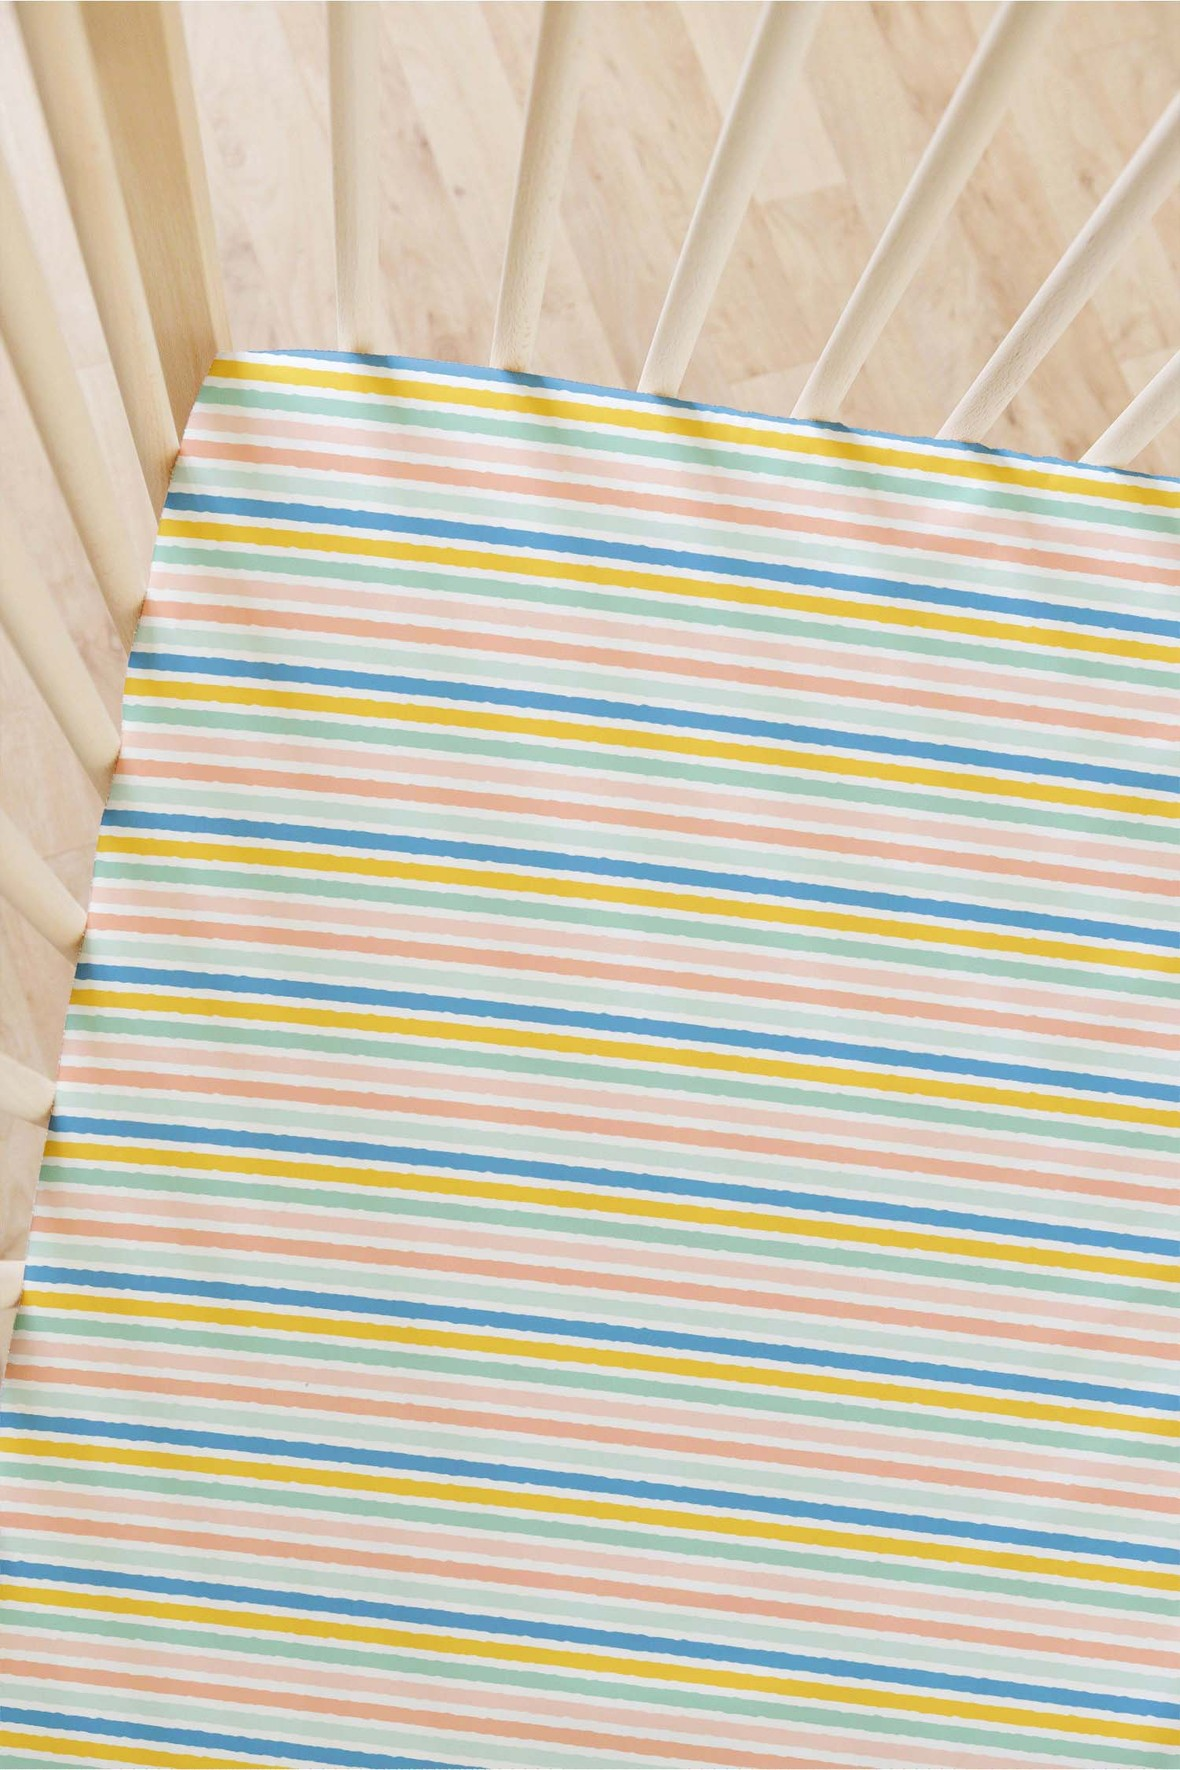 Indy Bloom Bitter Sweet Flat Crib Sheet- Stripes 6